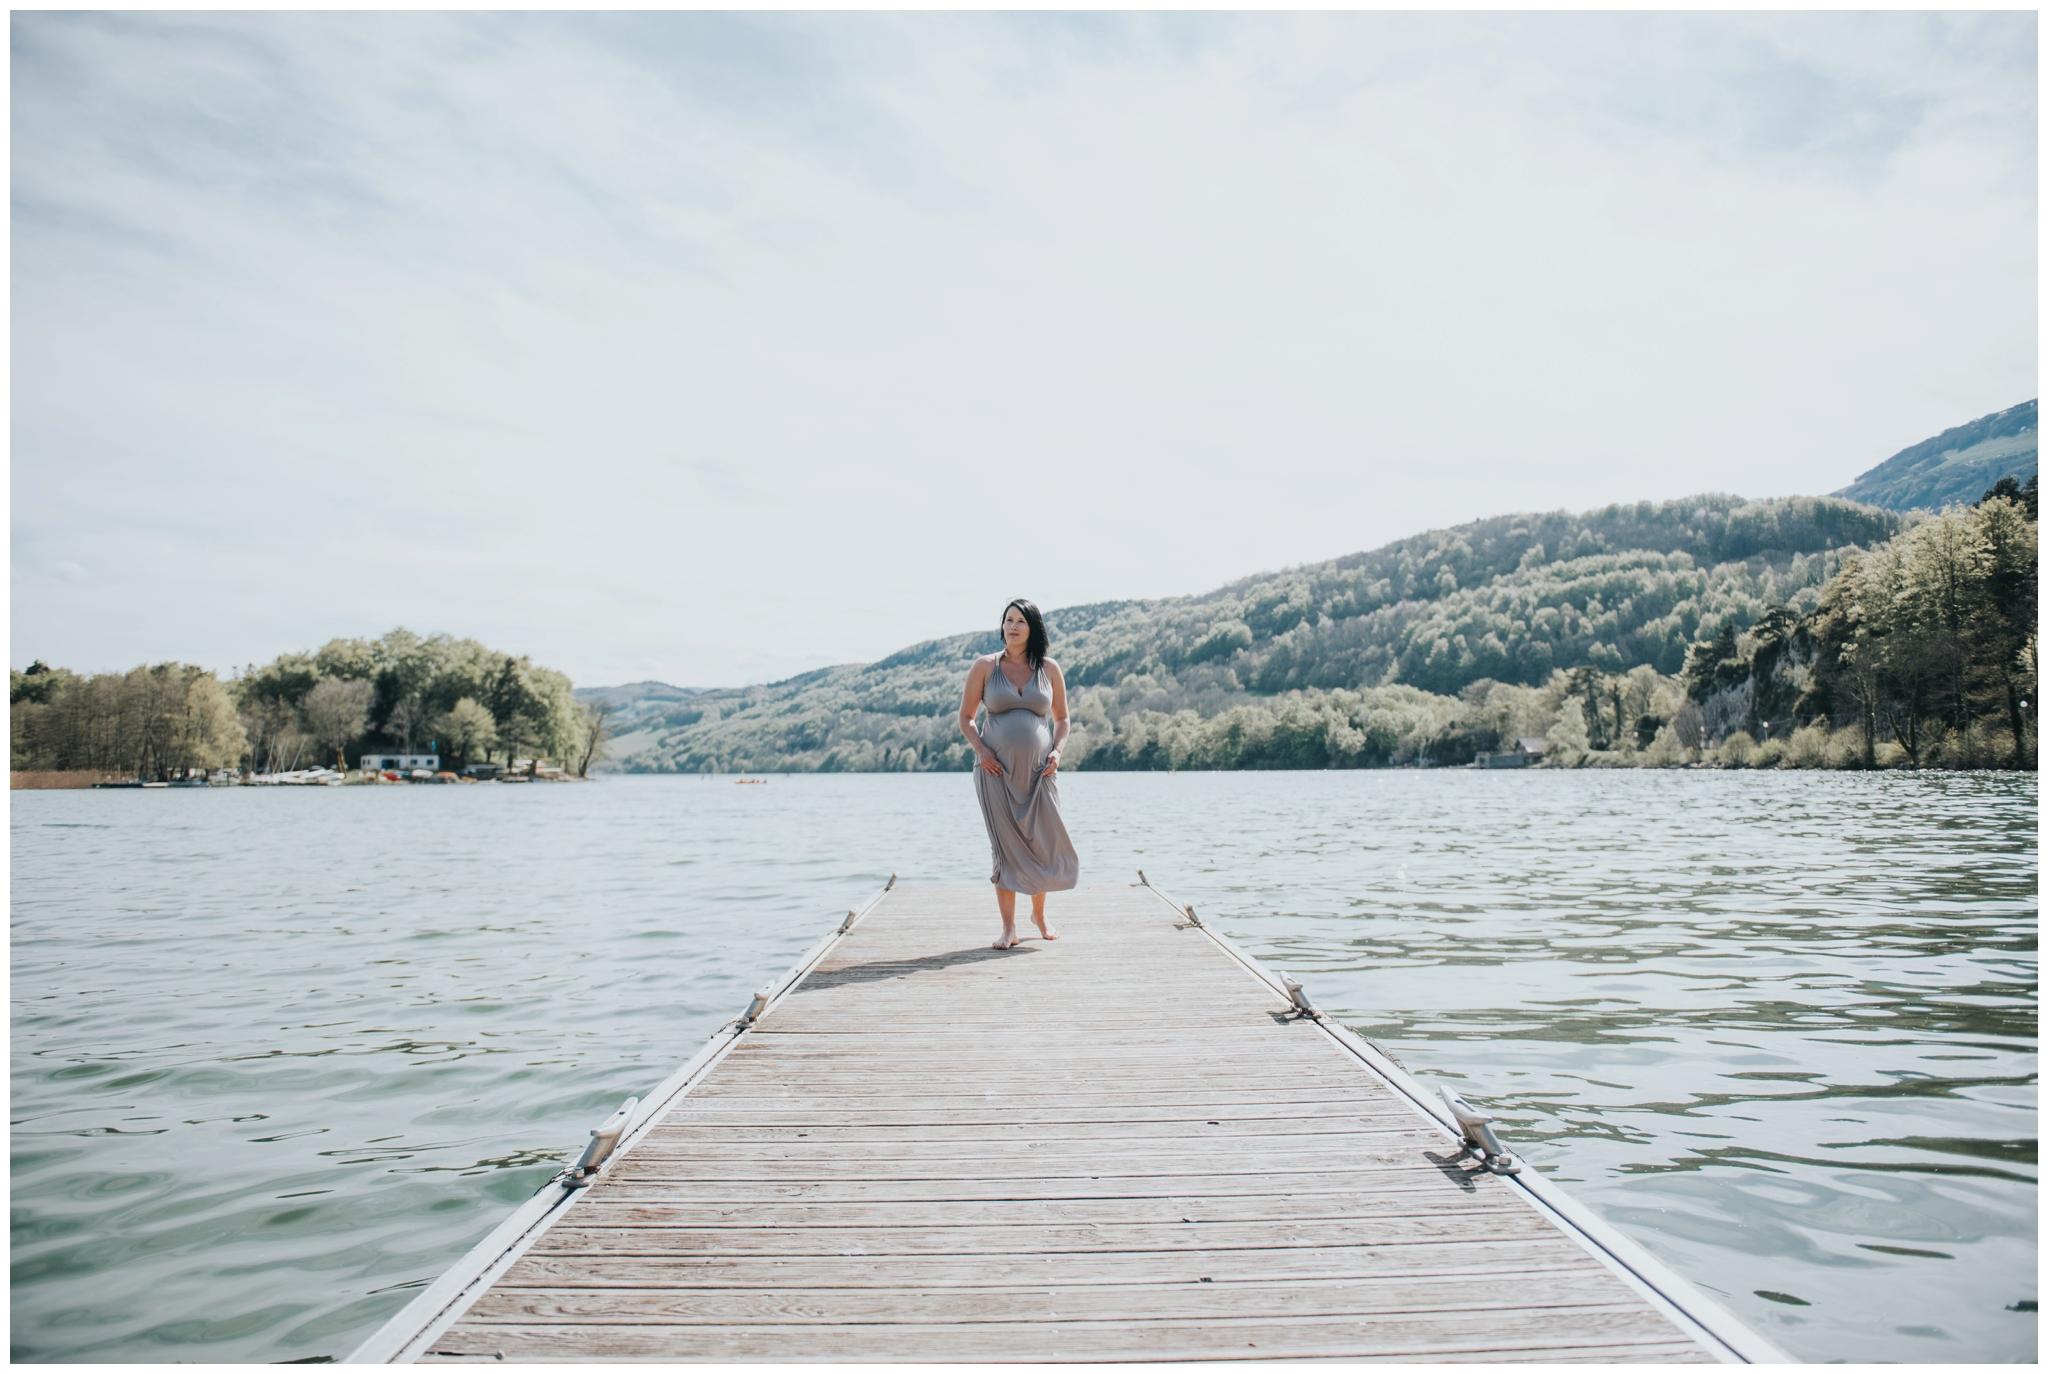 photographe grossesse future maman grenoble annecy lyon naturel lifestyle lac nouveau ne maternite famille seance photo famille _006